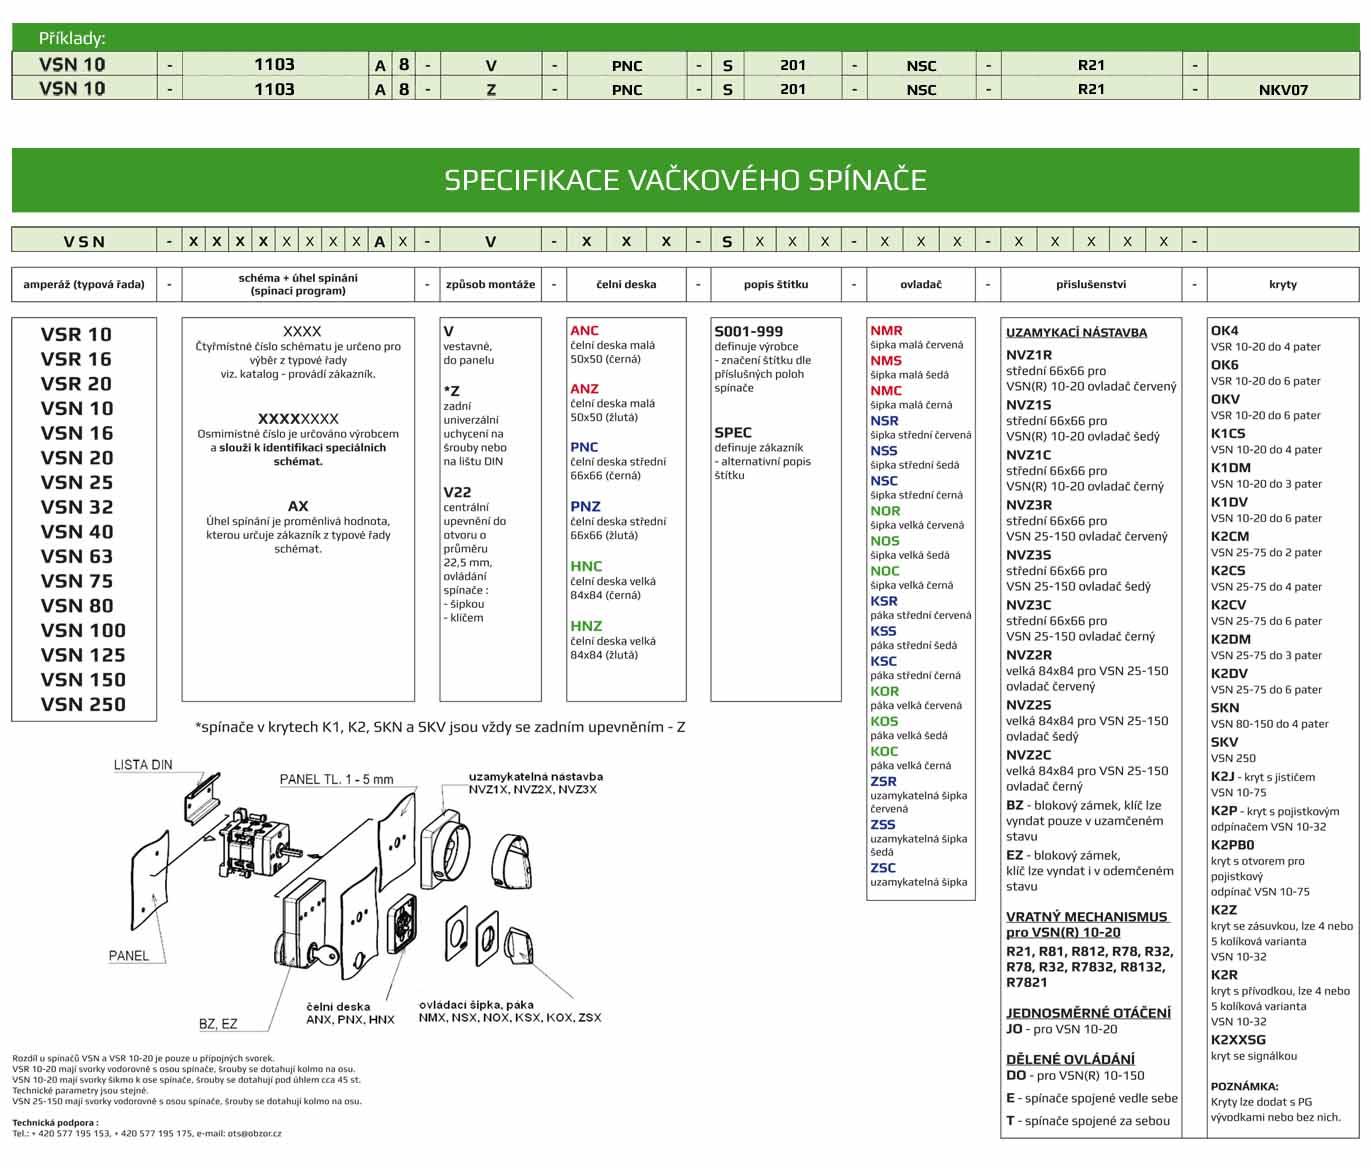 specifikace vackoveho spinace